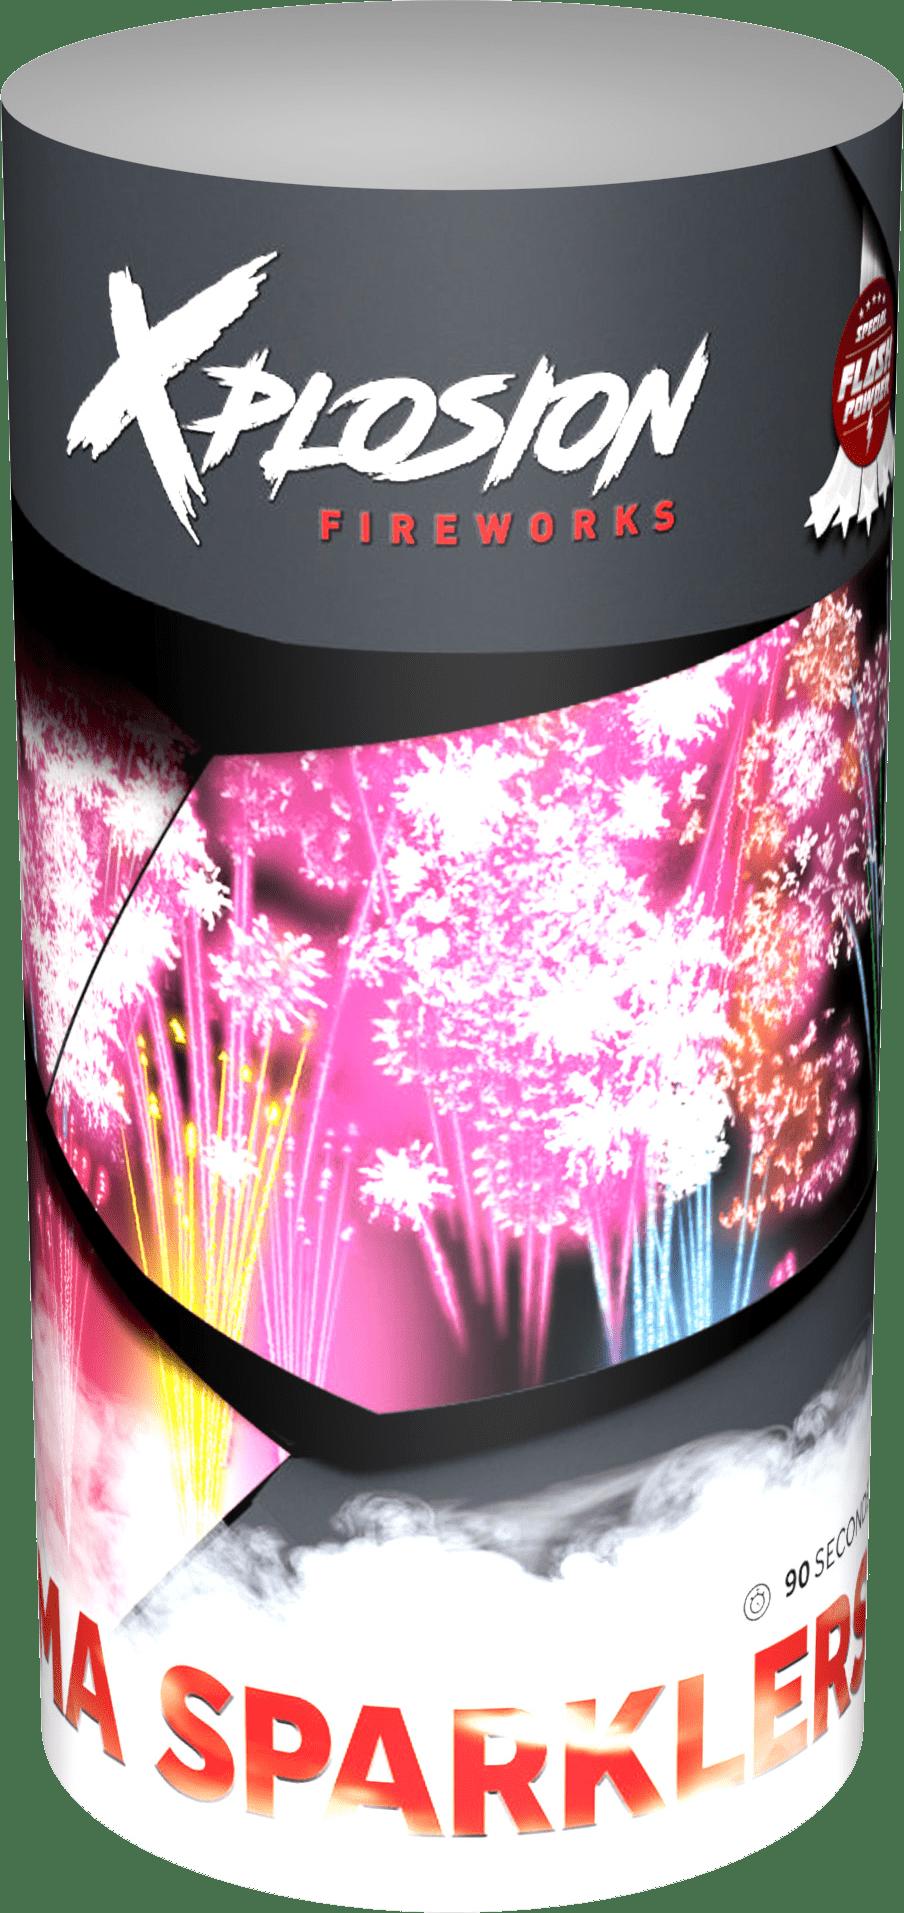 Prisma Sparklers